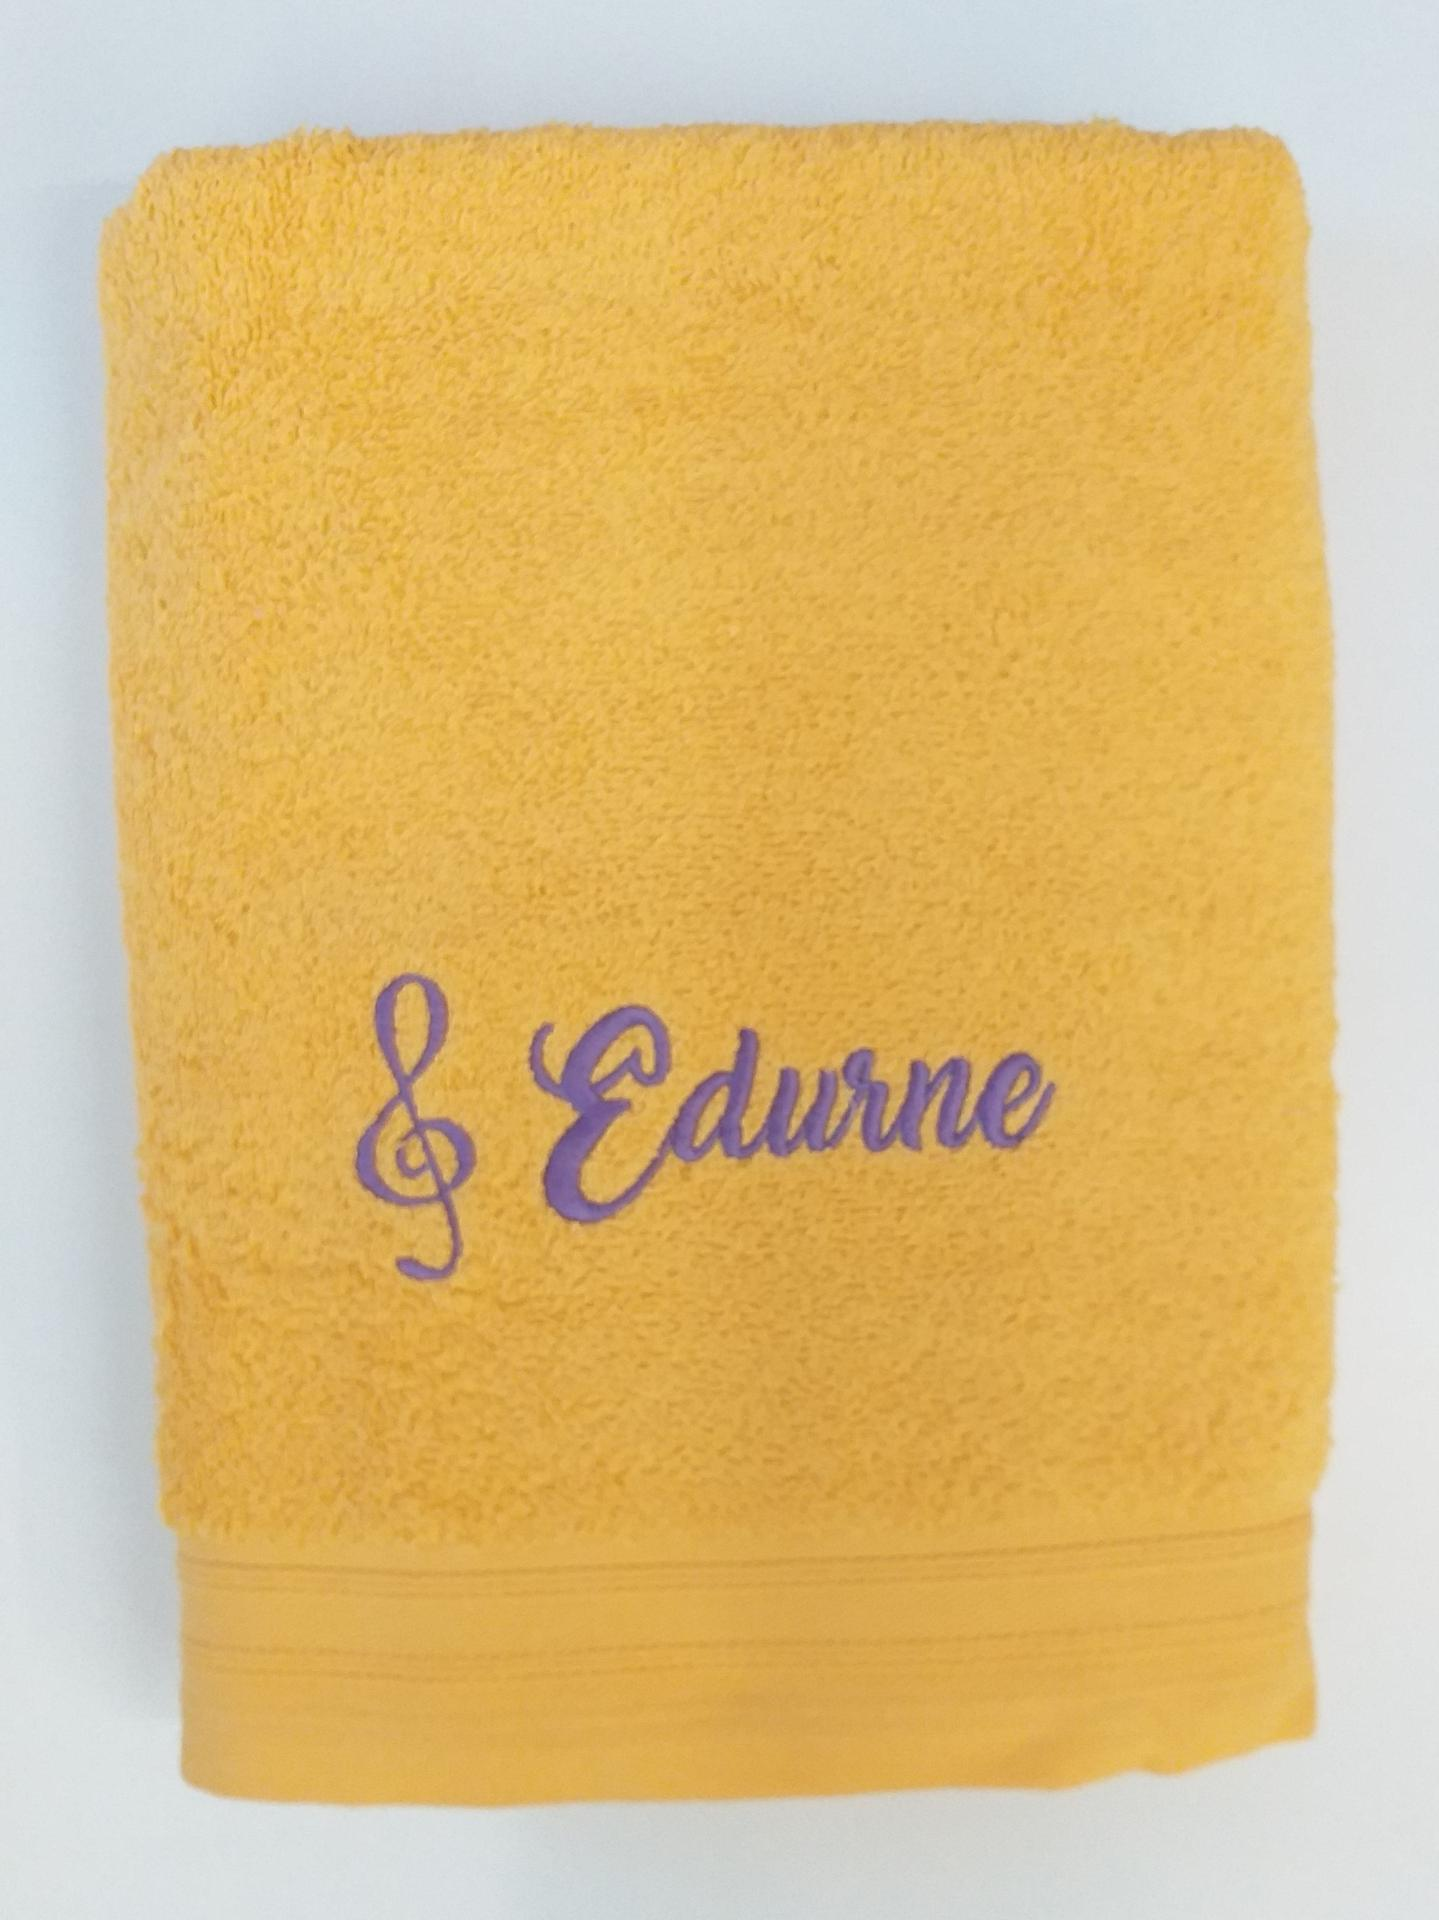 Toalla amarilla Edurne.